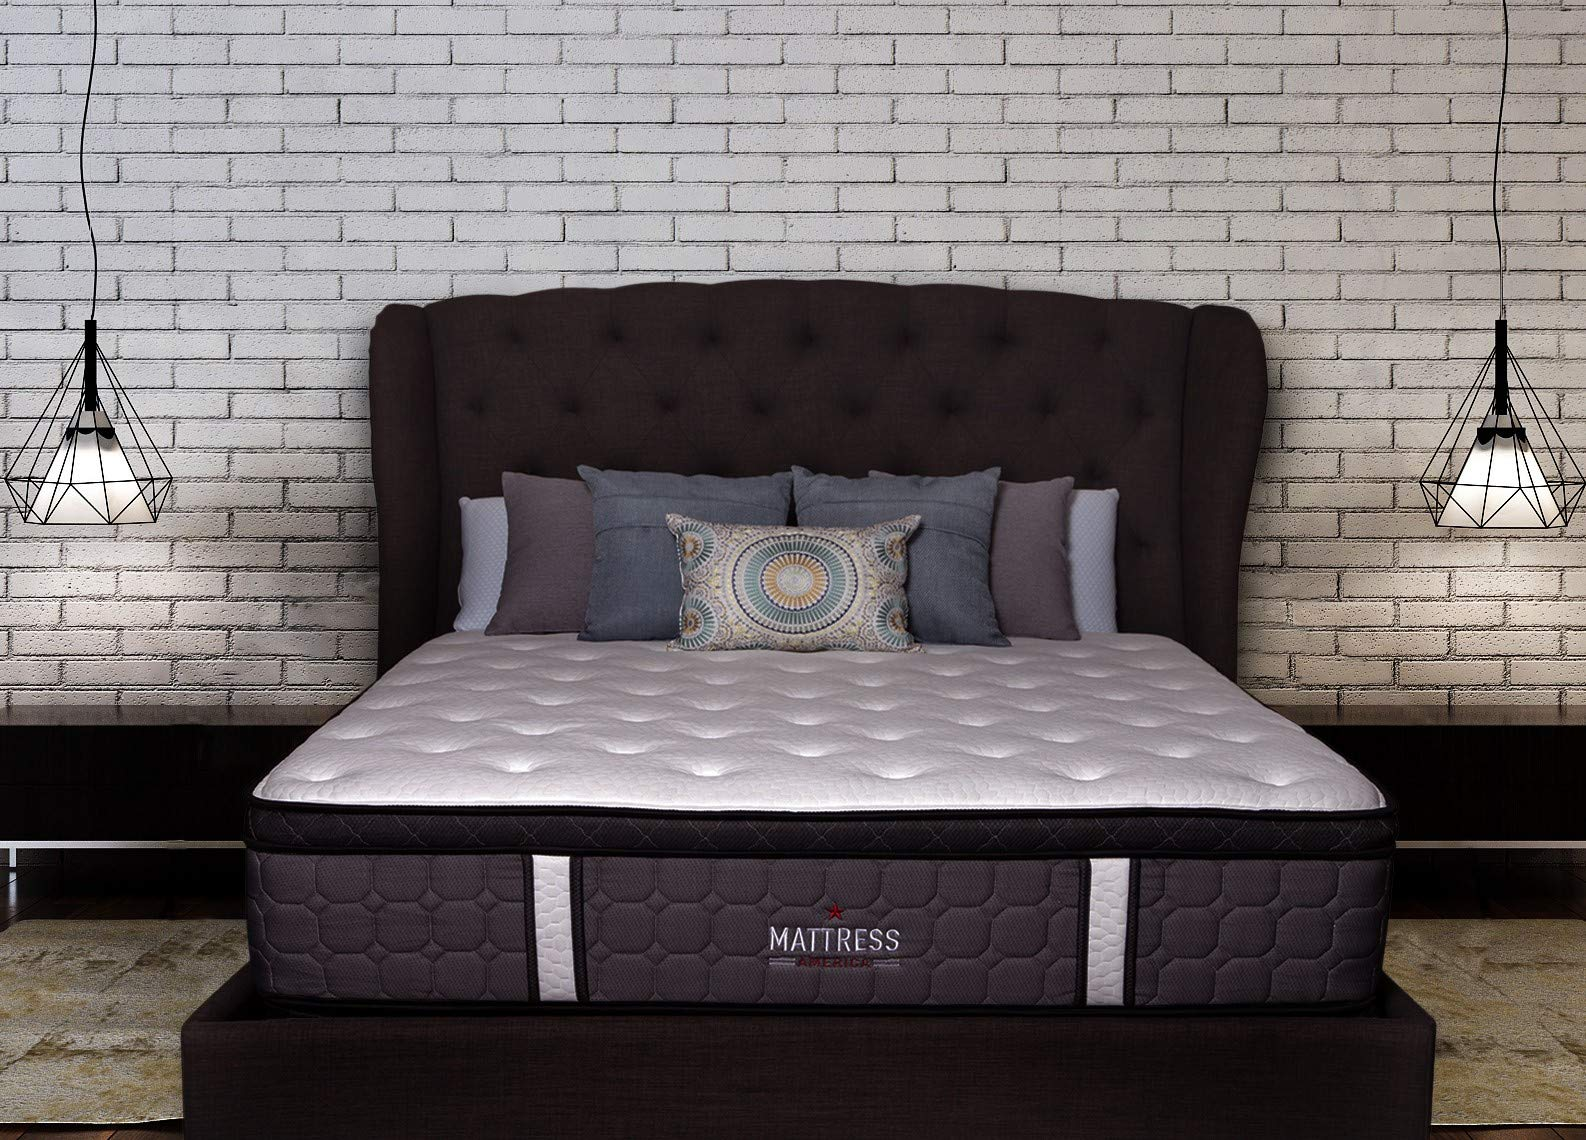 Mattress America Frost 13 Inch Hybrid Pocket Coil Pillow Top Mattress Gel Infused Memory Foam (Queen)